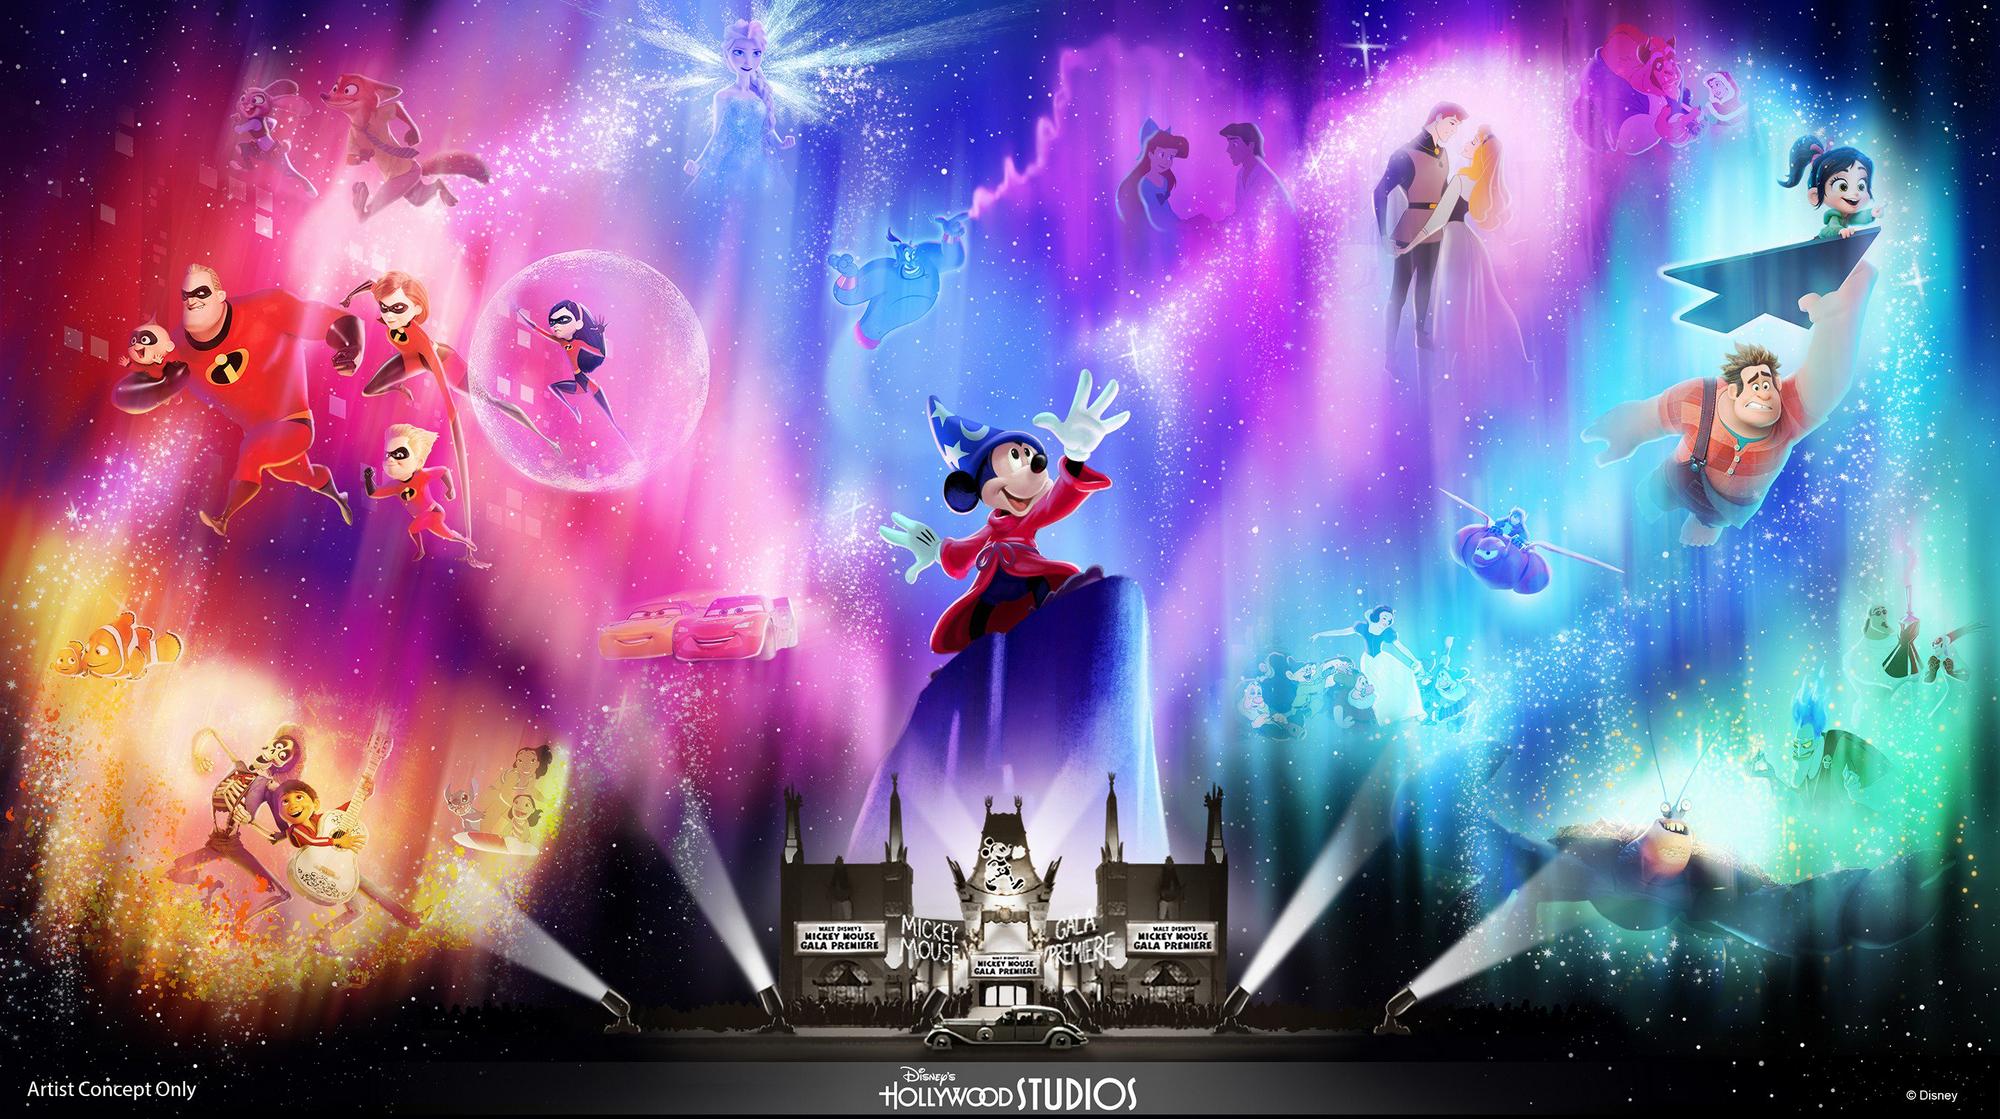 68aeeb3c97f7e Wonderful World of Animation | Disney Wiki | FANDOM powered by Wikia